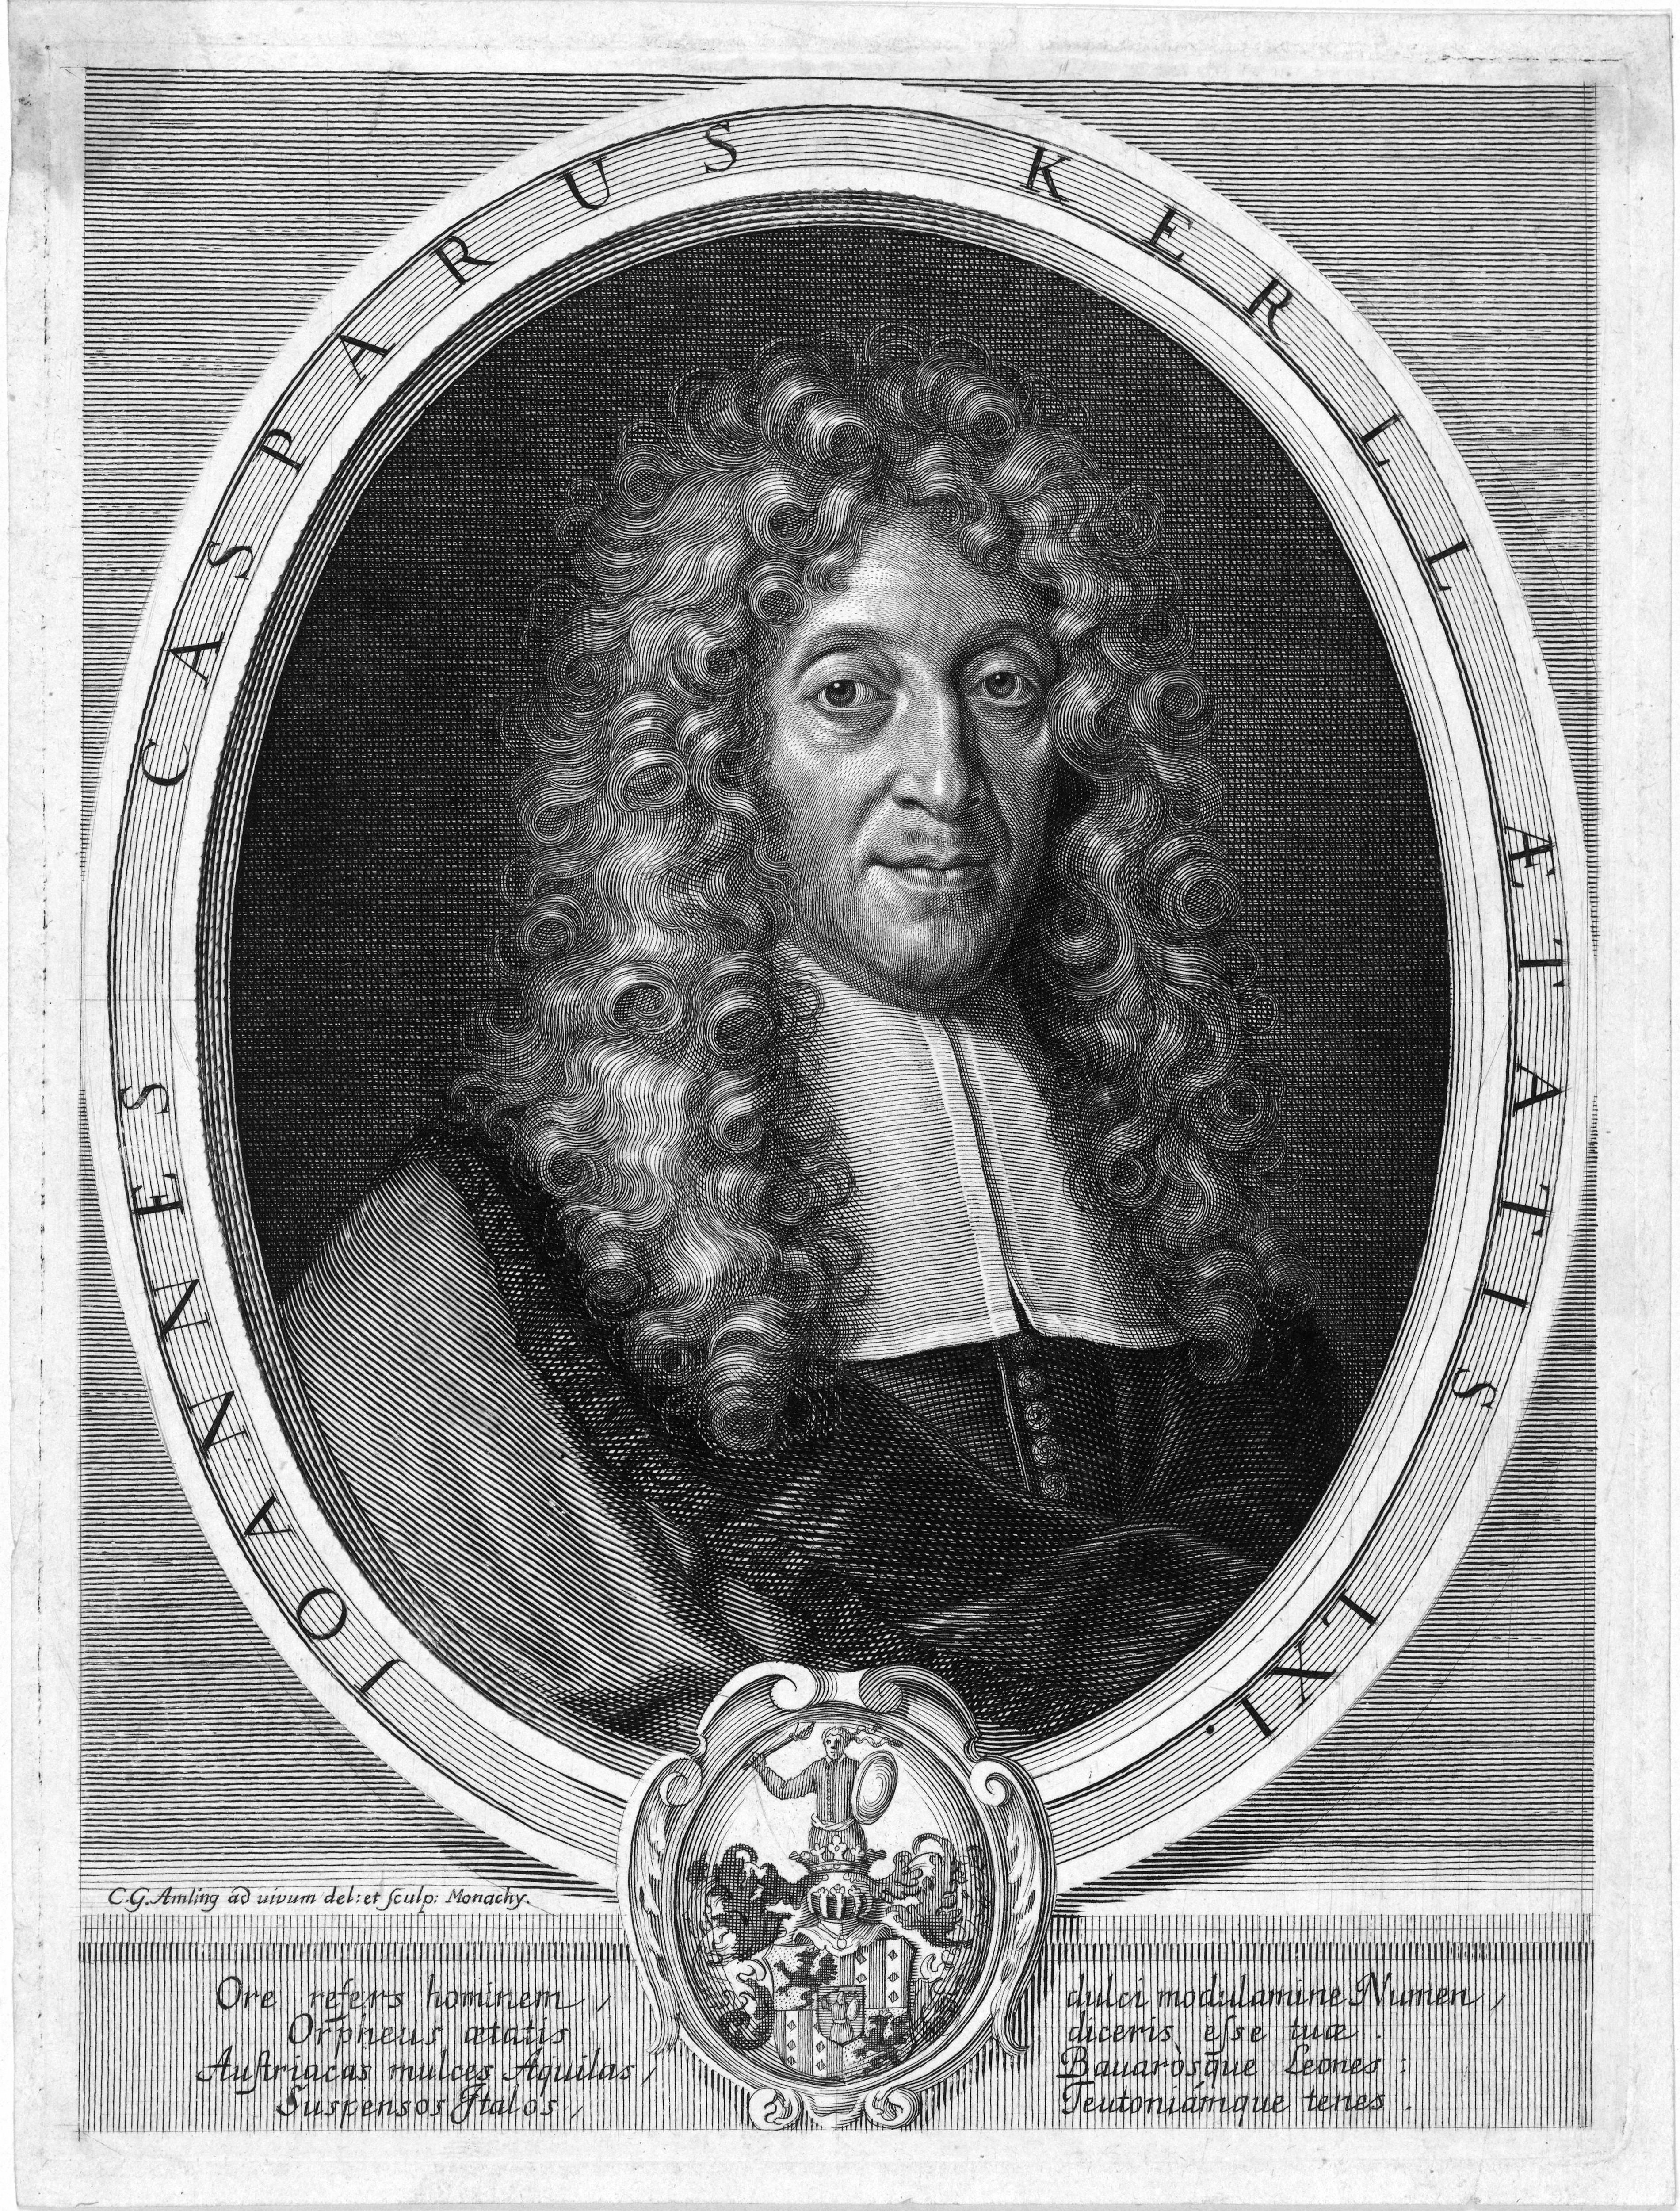 Portrait, made around 1685-1688 during his stay in Munich.